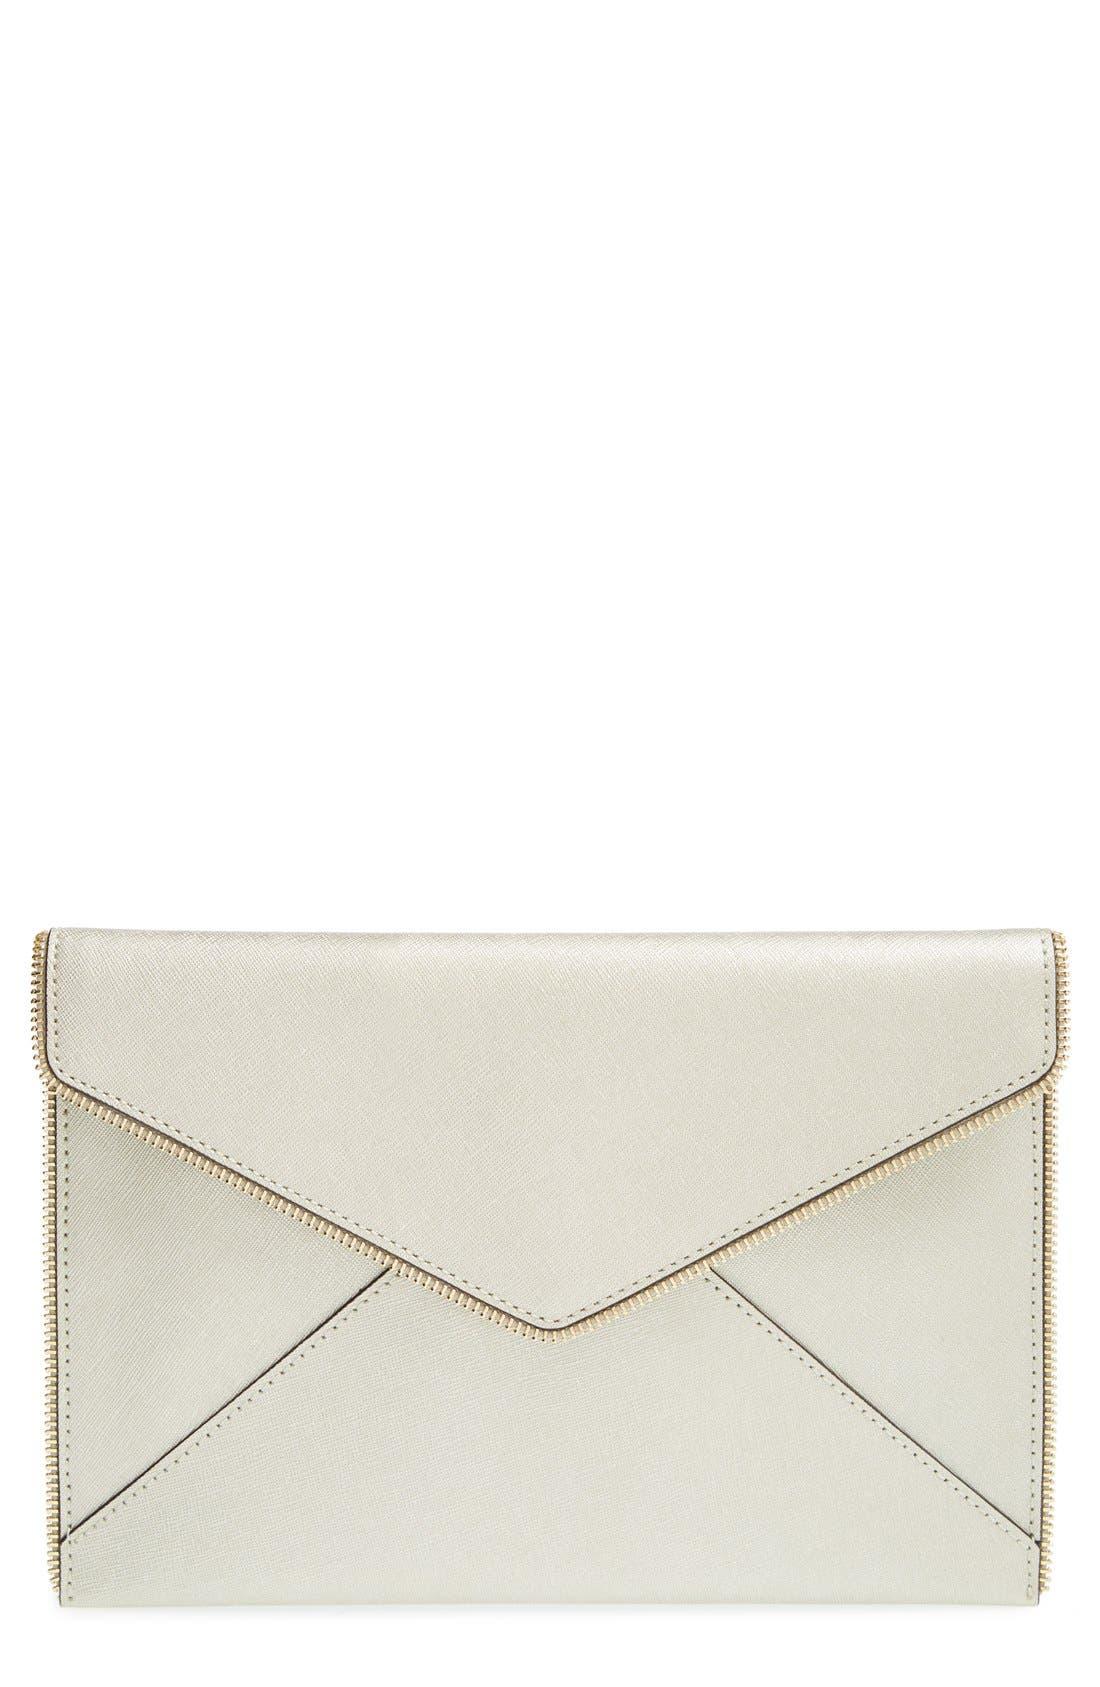 Alternate Image 1 Selected - Rebecca Minkoff 'Leo' Saffiano Leather Envelope Clutch